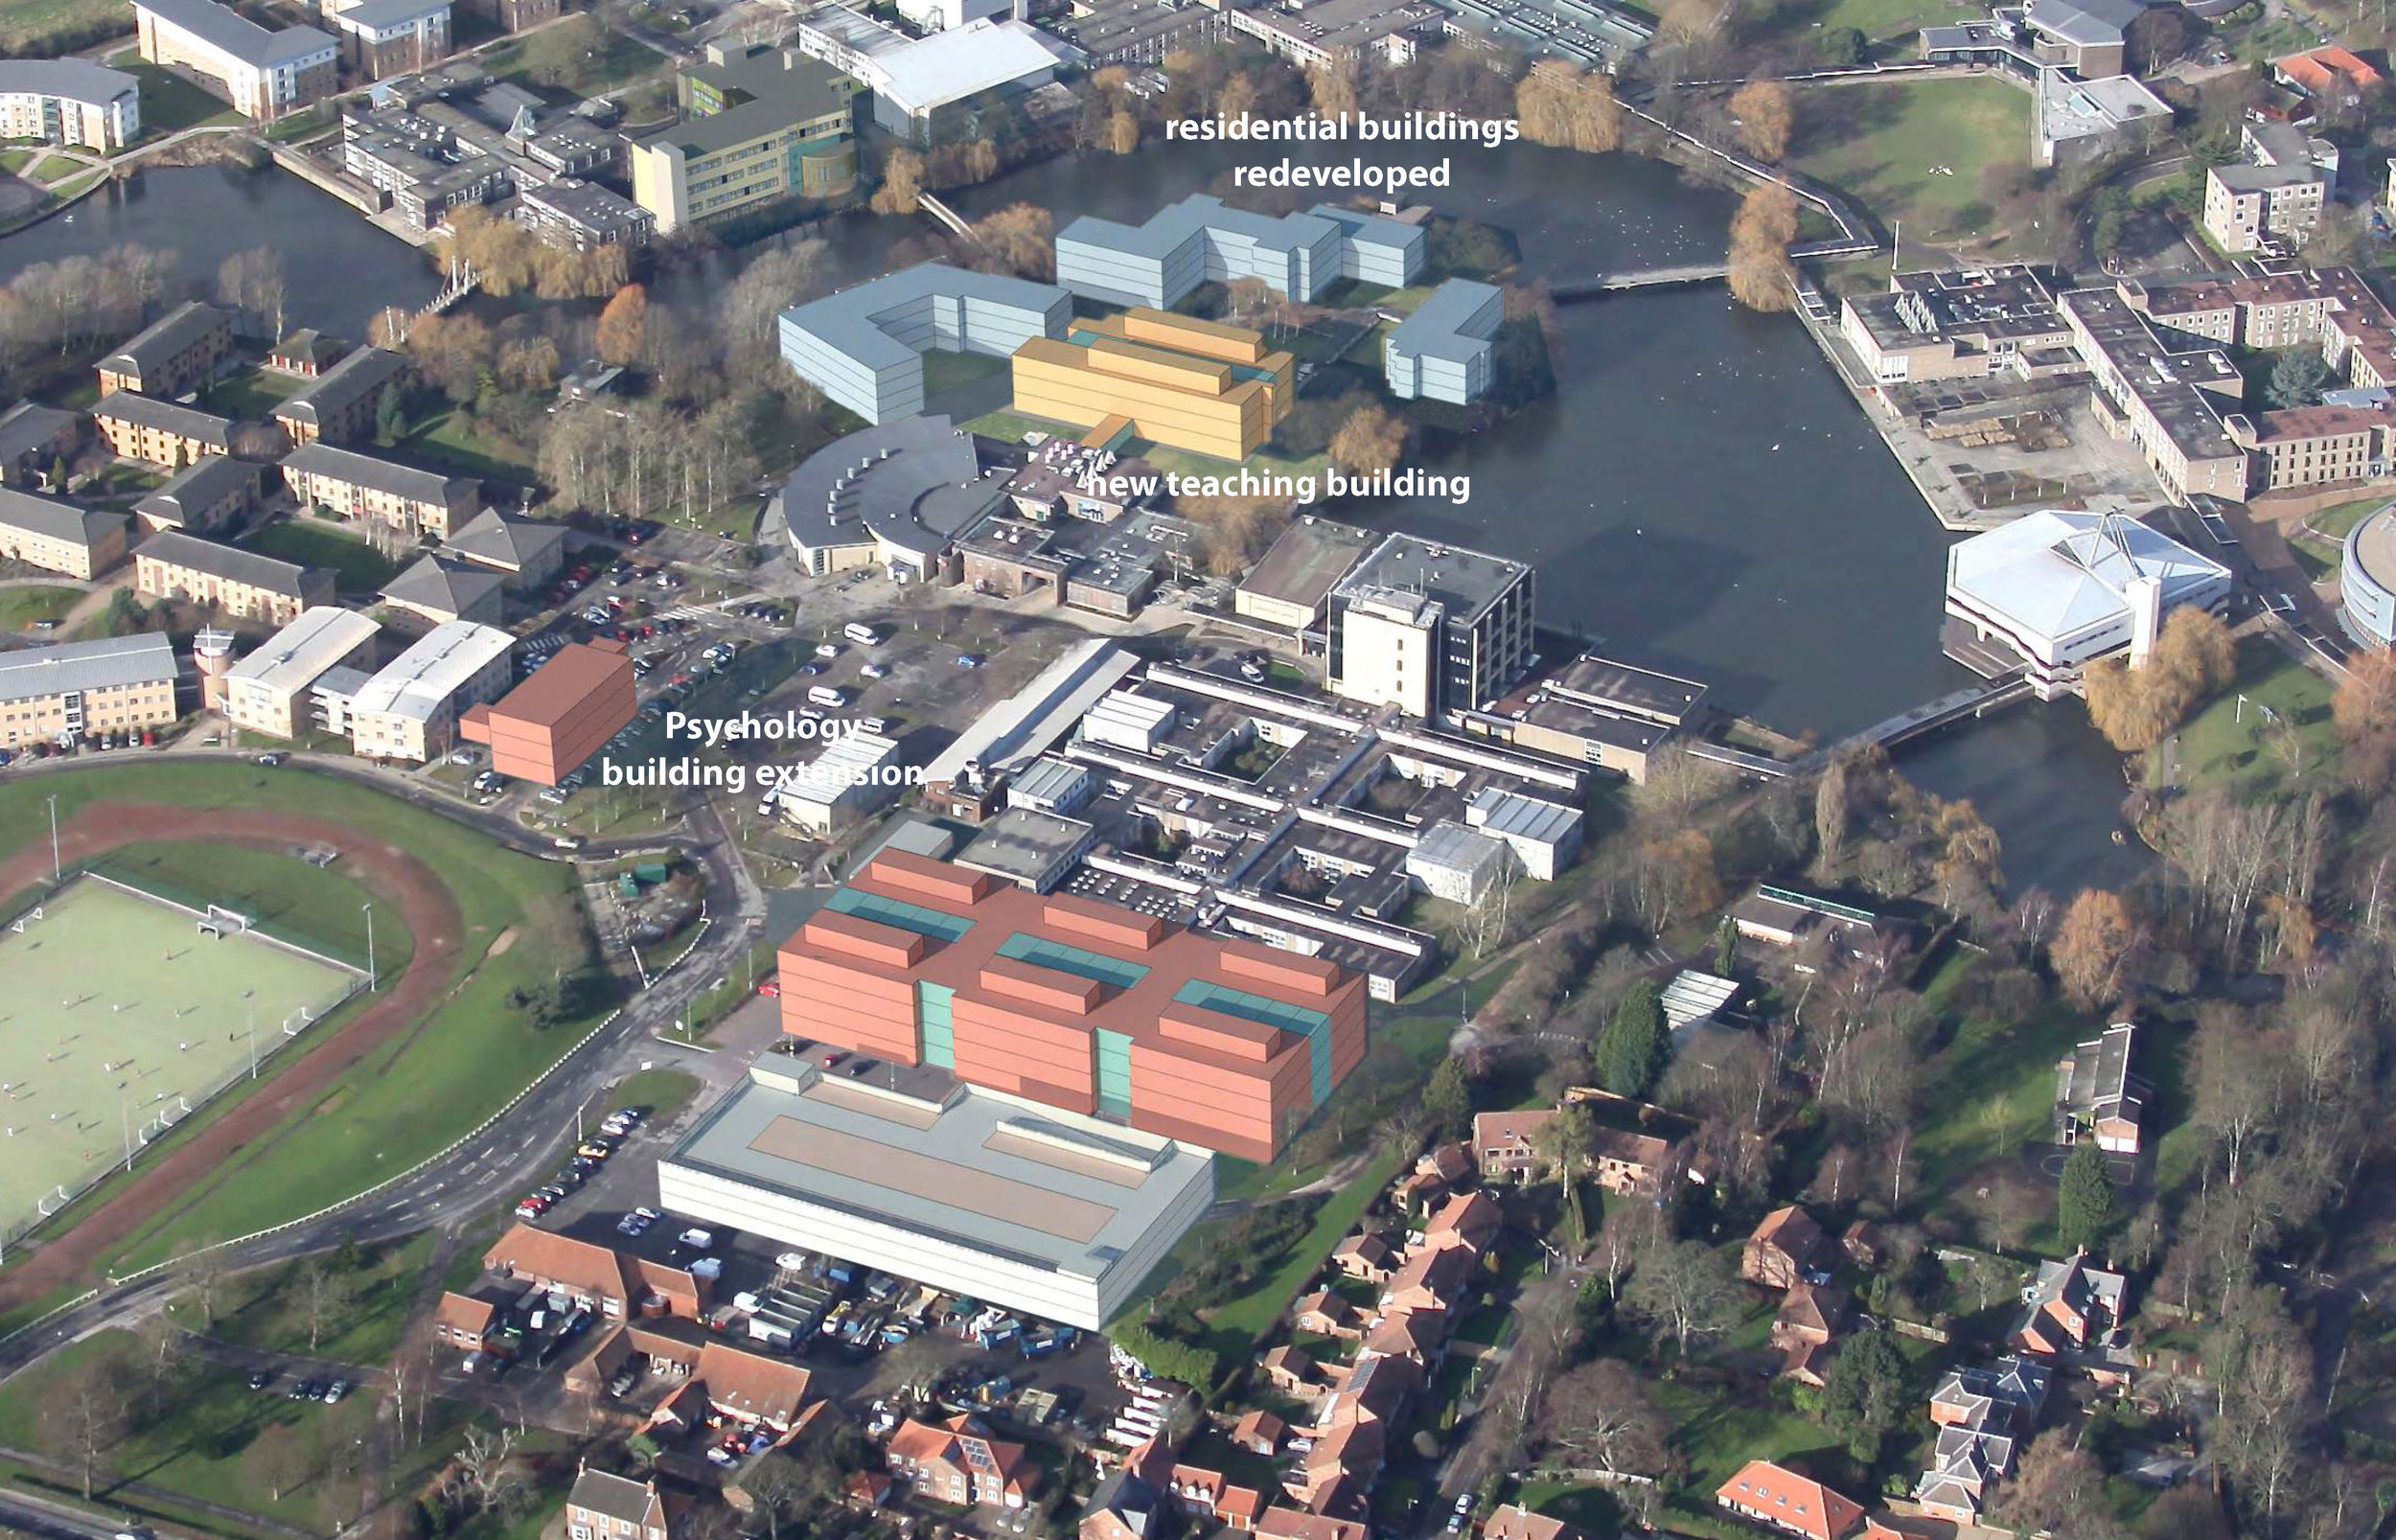 Stephen-Hill-Architects-YorkMasterPlan-15